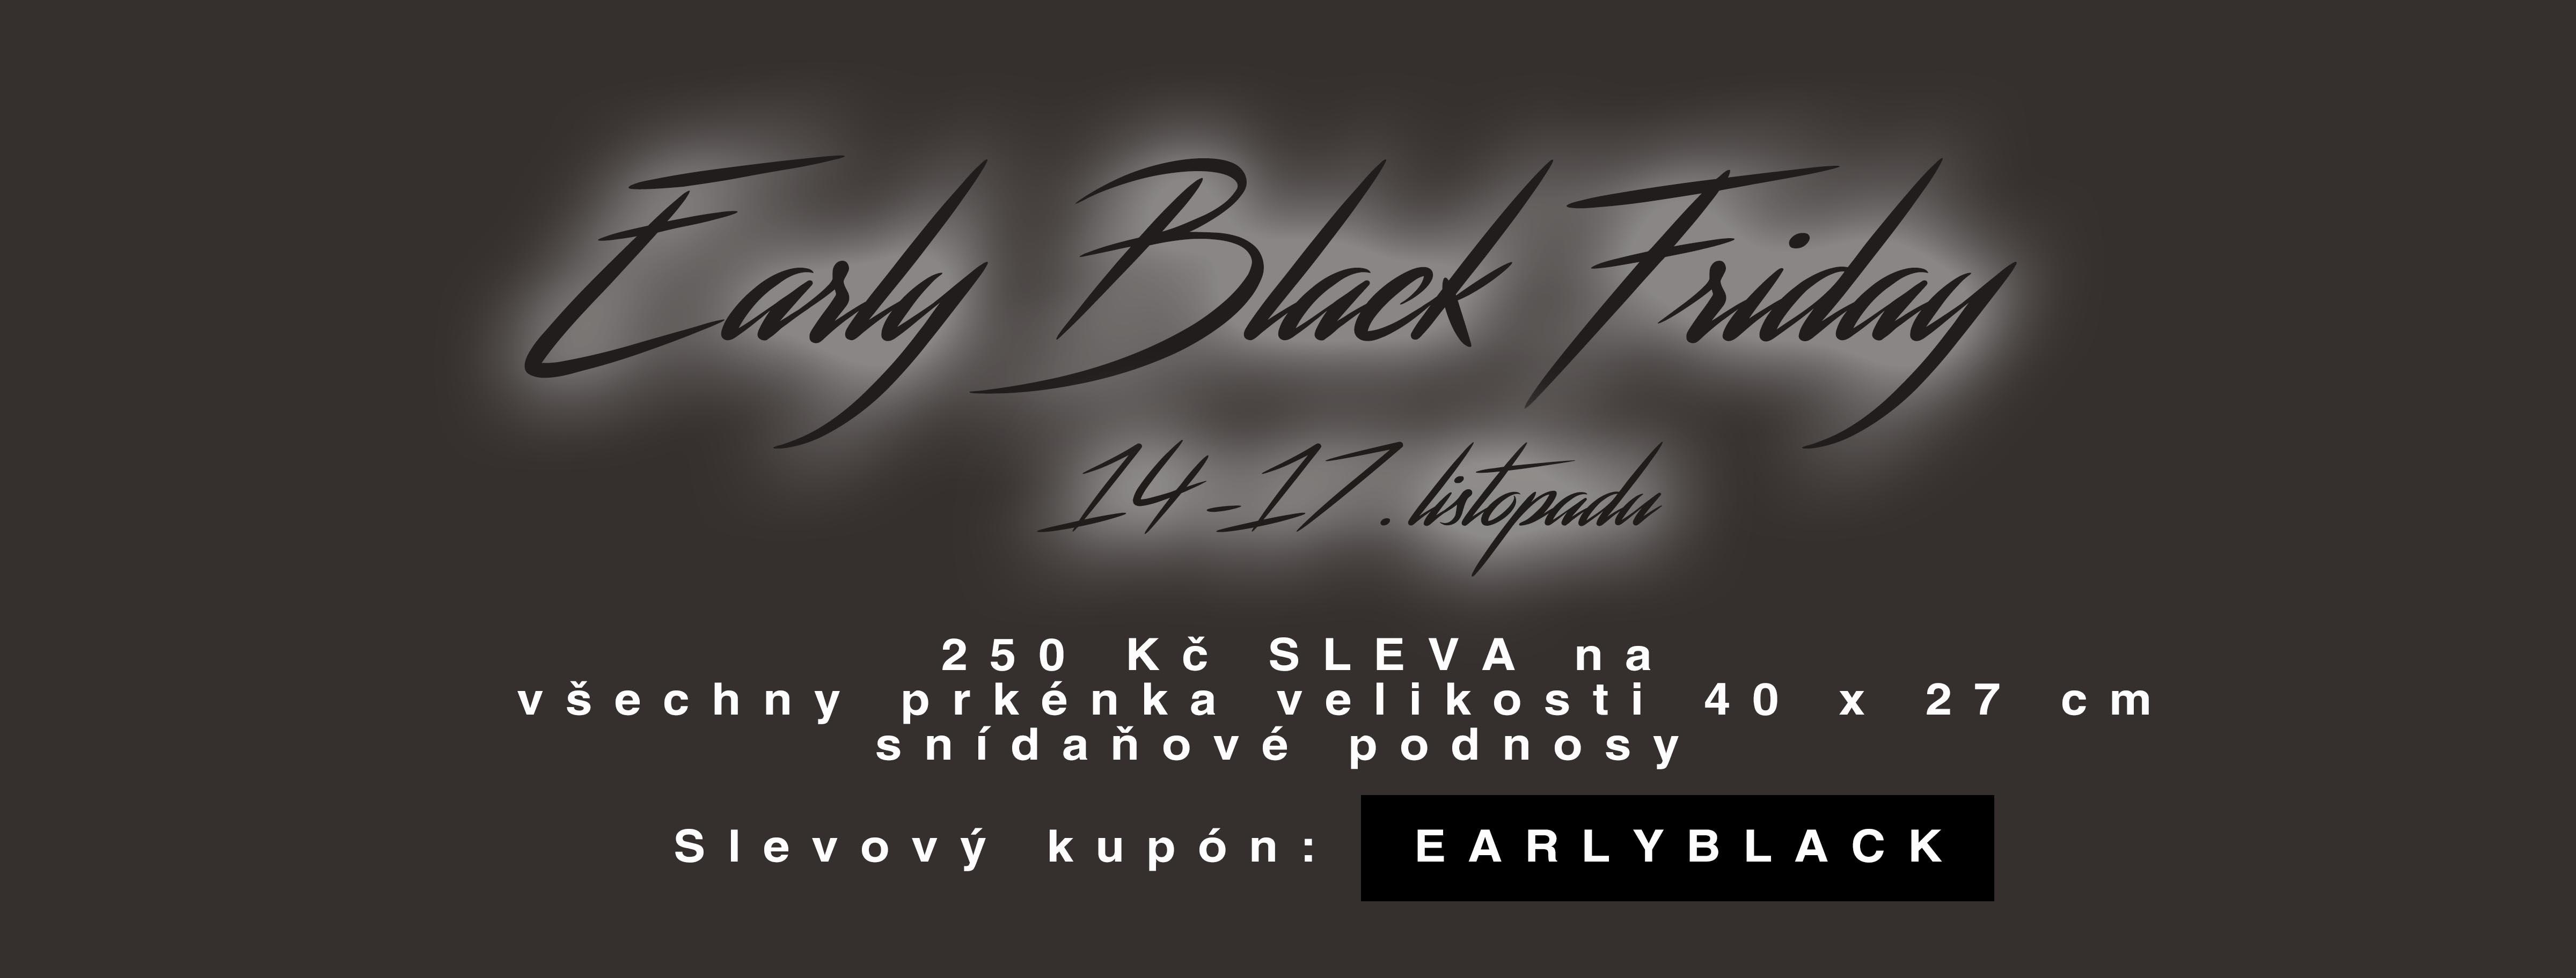 Early Black Friday